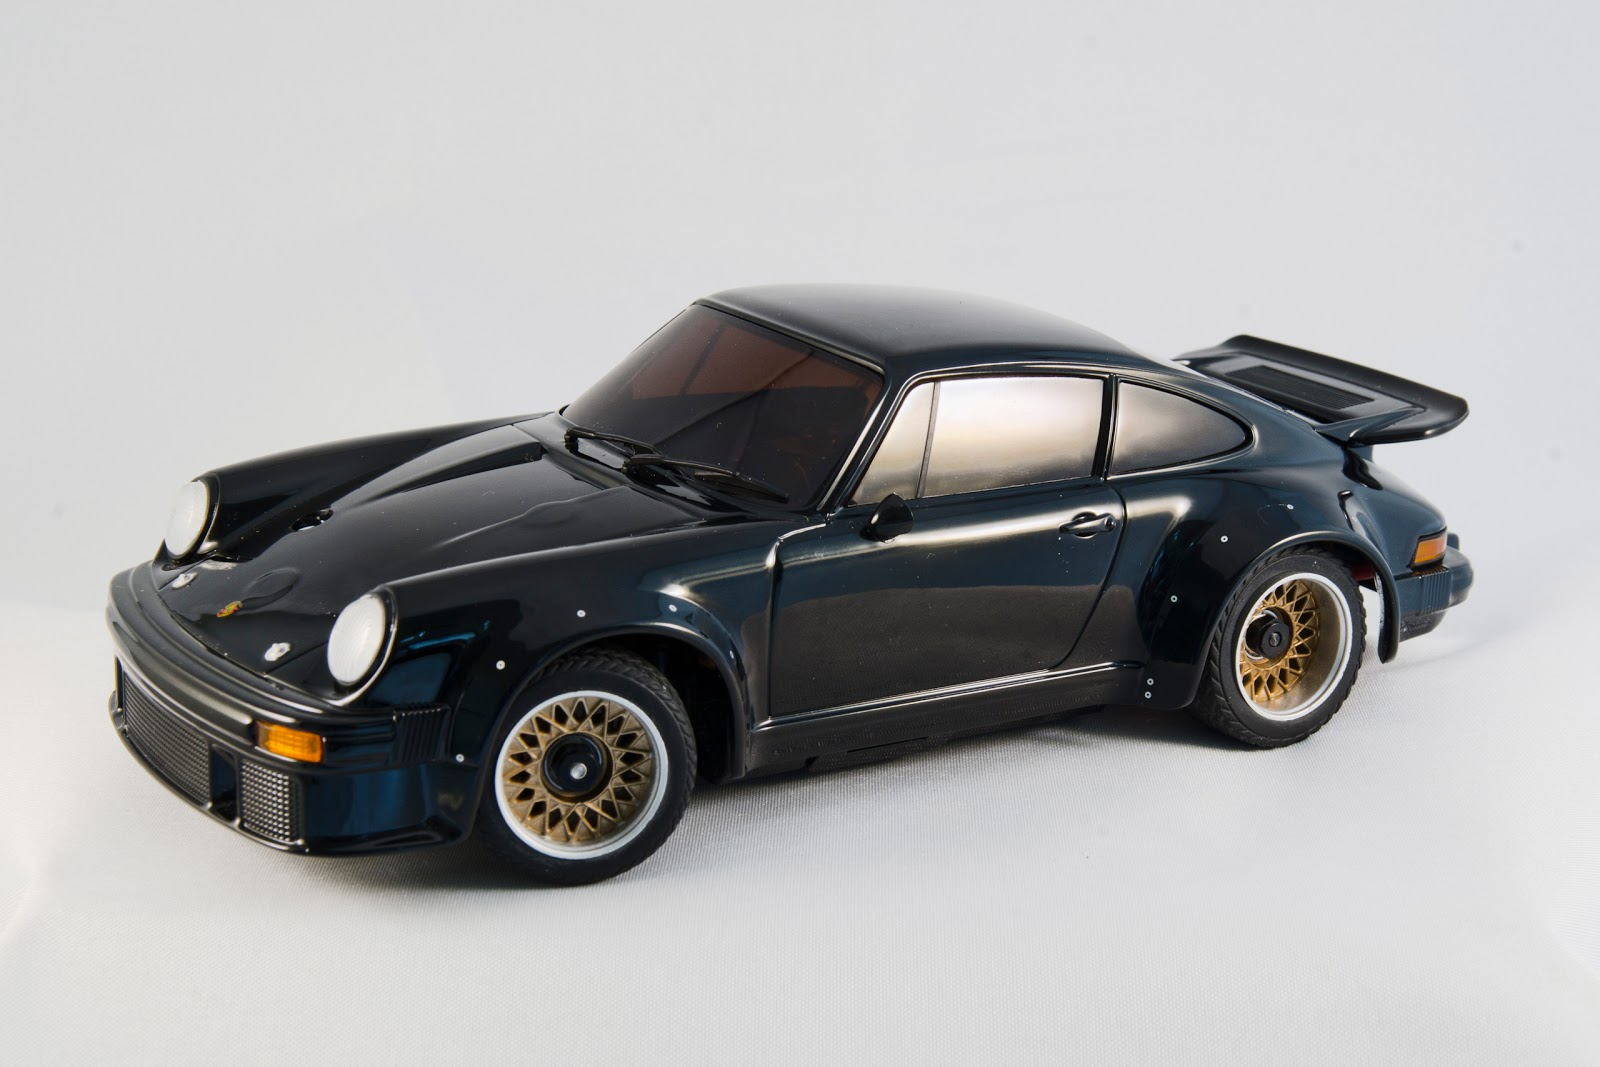 kyosho mini z porsche 911 gt1 kyosho mini z white porsche 911 gt1 body set mzp330w autoscale. Black Bedroom Furniture Sets. Home Design Ideas